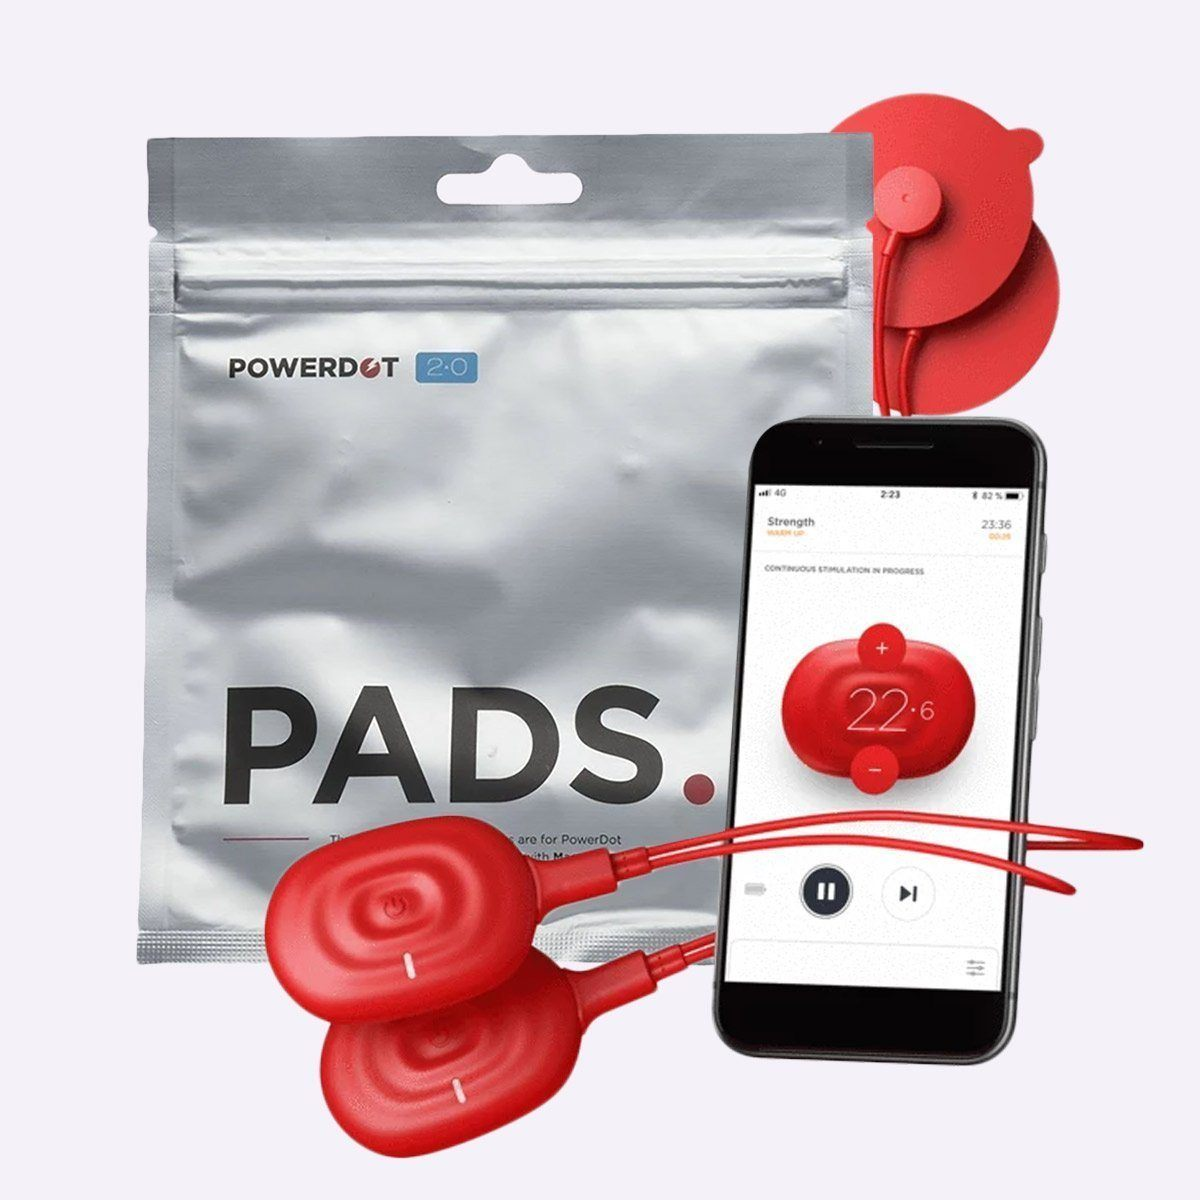 PowerDot 2.0 DUO - The Pro Bundle – The WOD Life